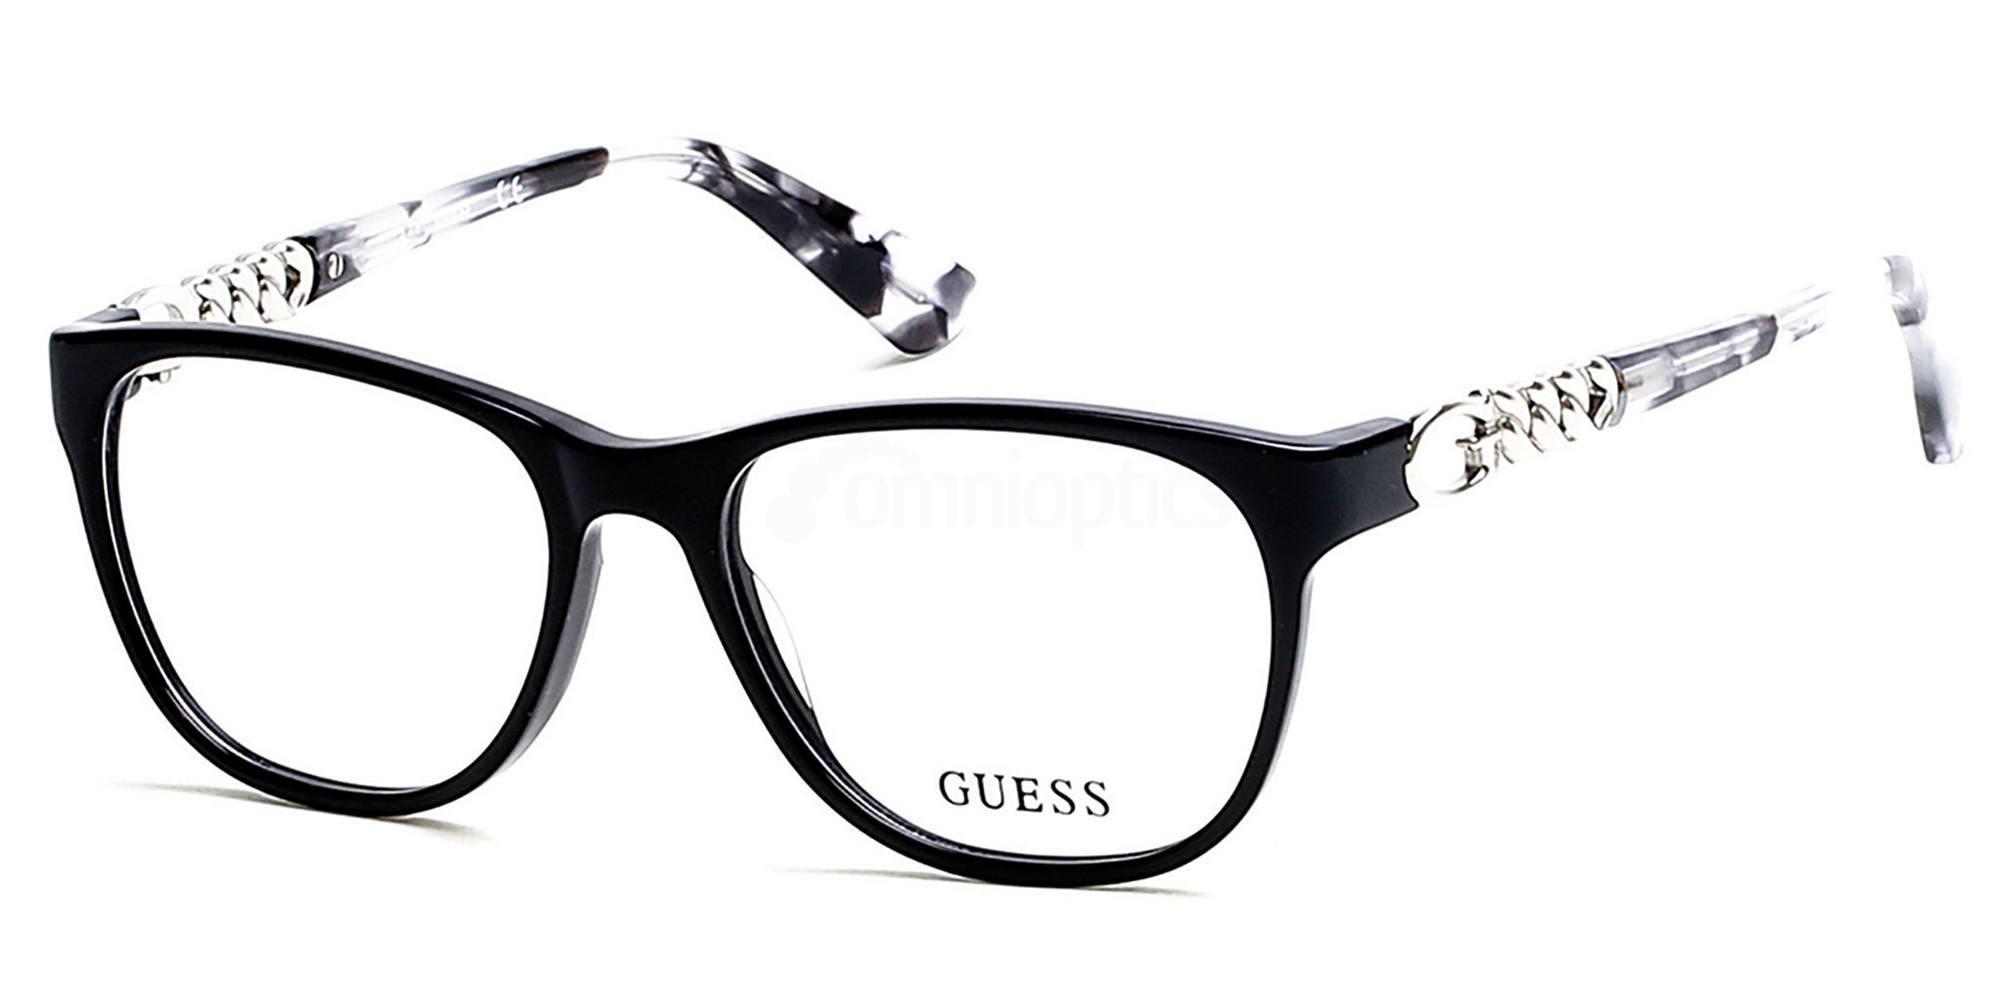 001 GU2559 , Guess